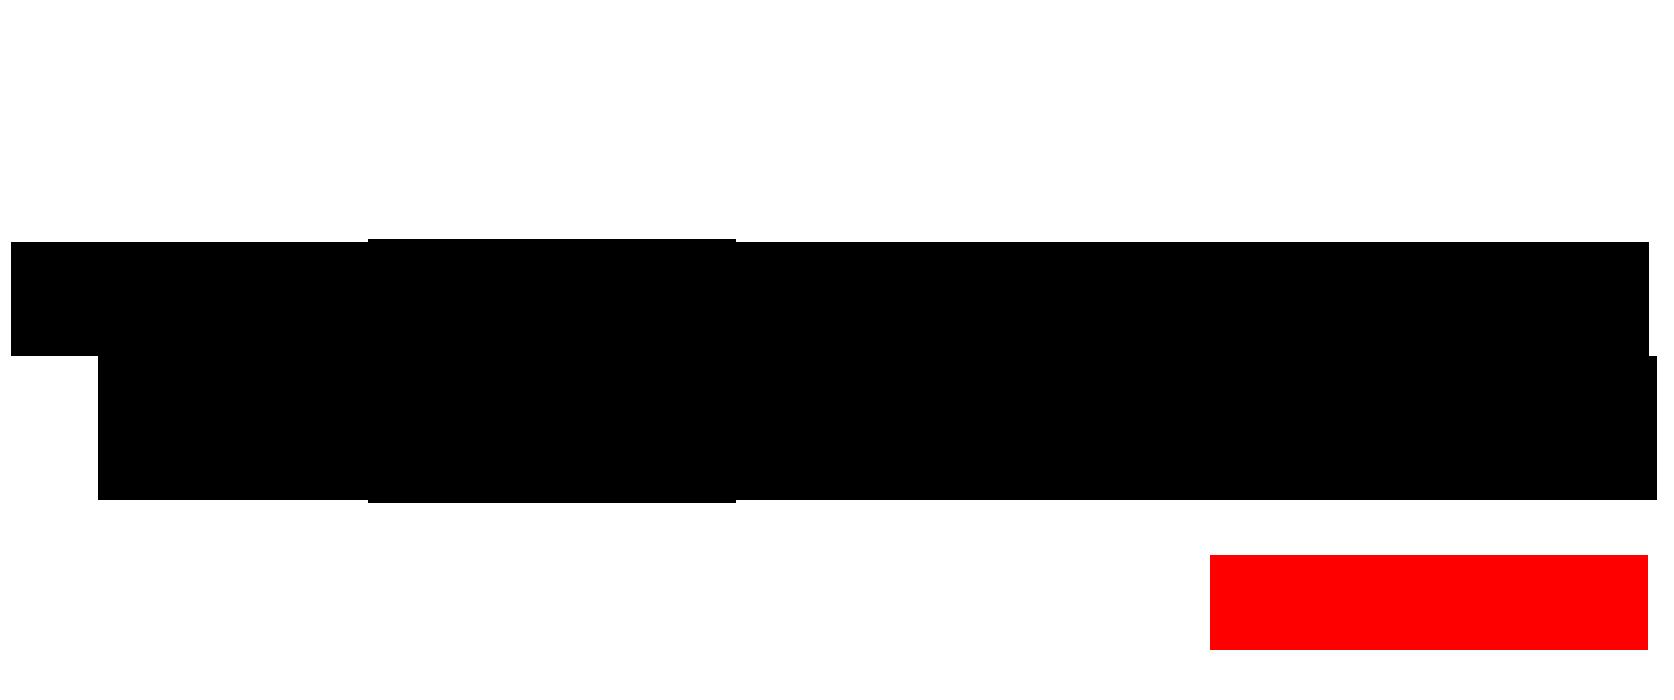 Logo de la gamme TOTALE Maxi